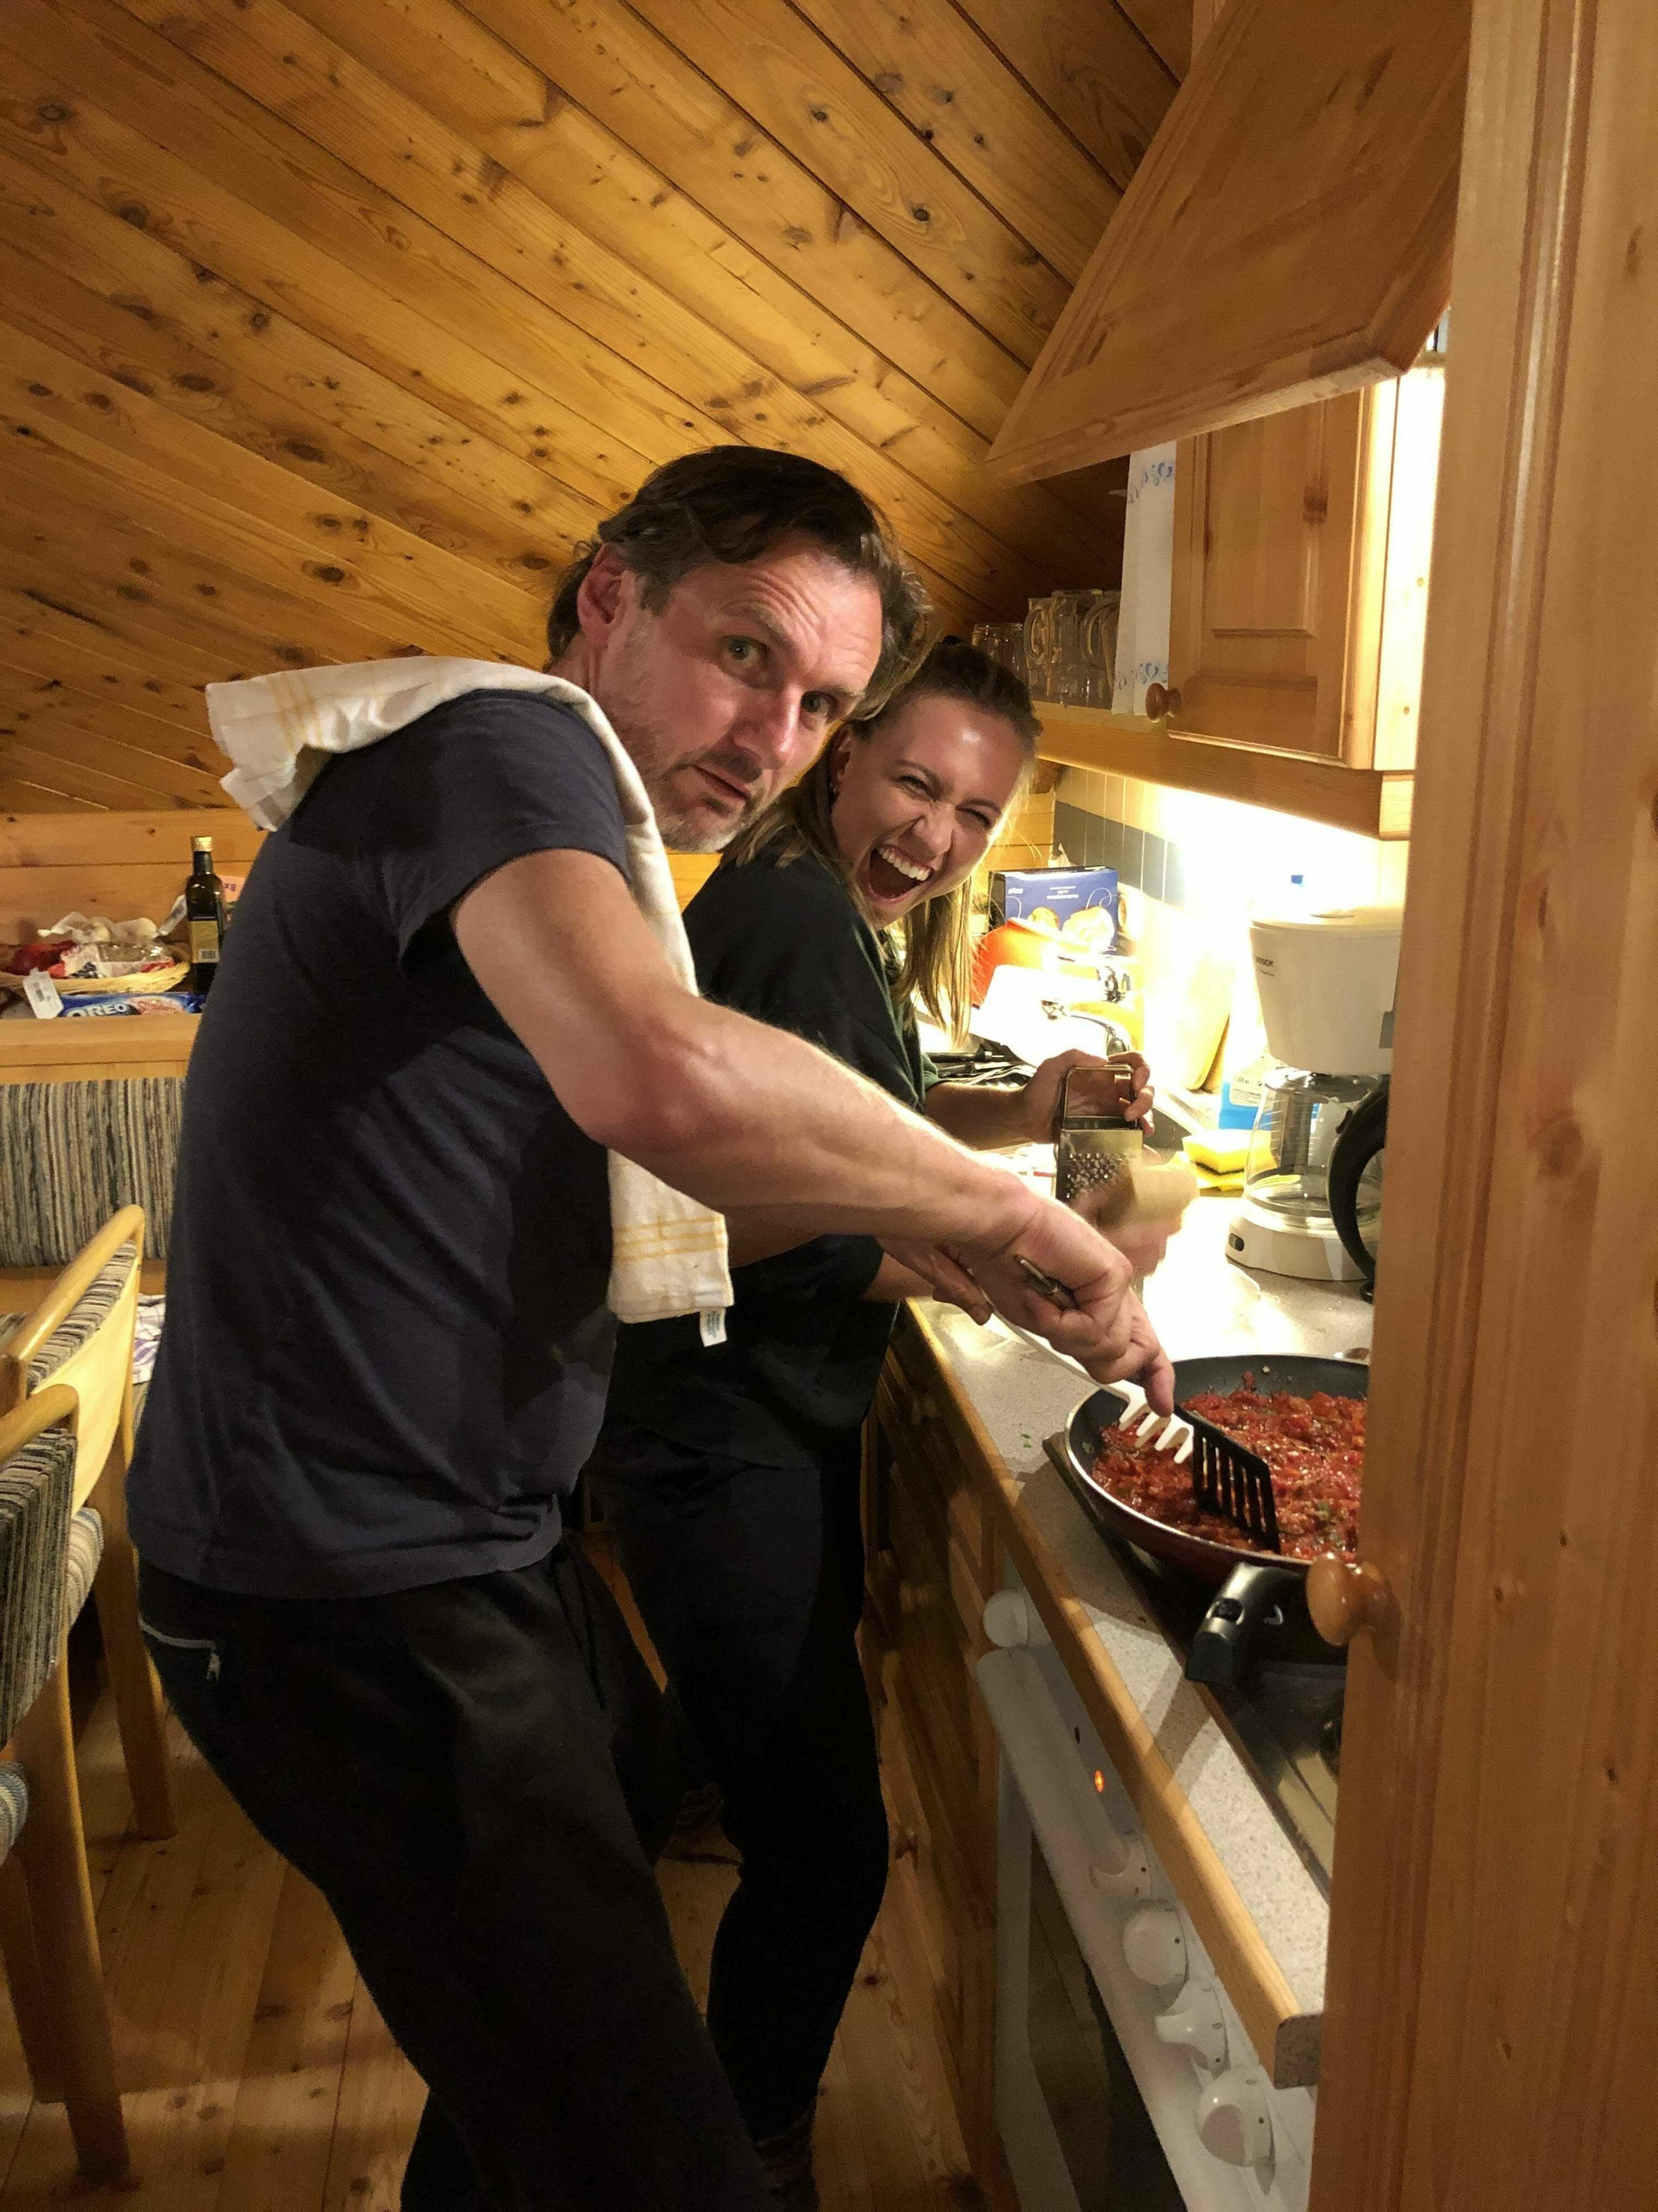 Glockner Mesenaten kochen